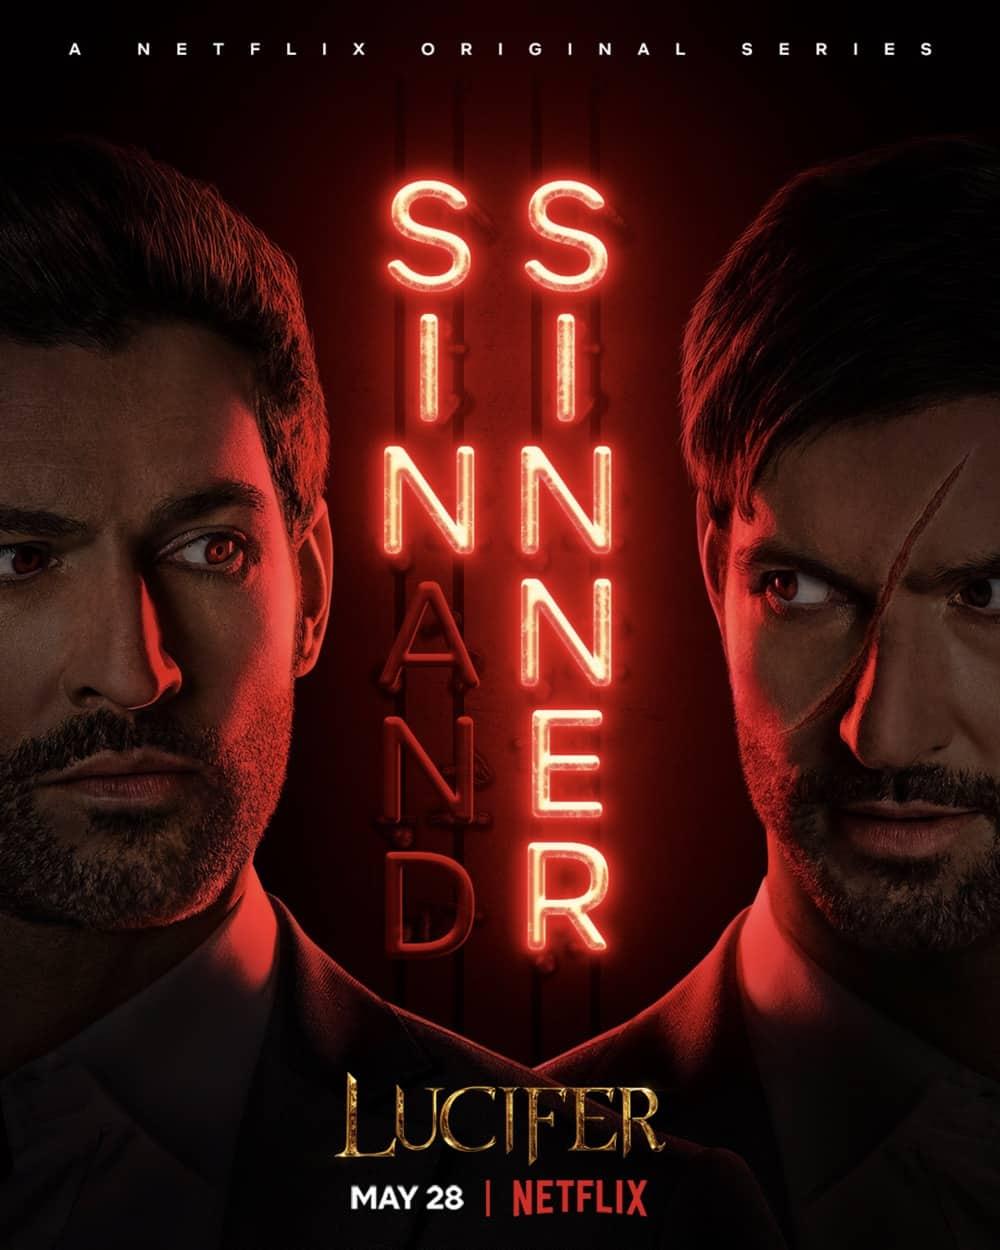 Lucifer Season 5 Part 2 Poster